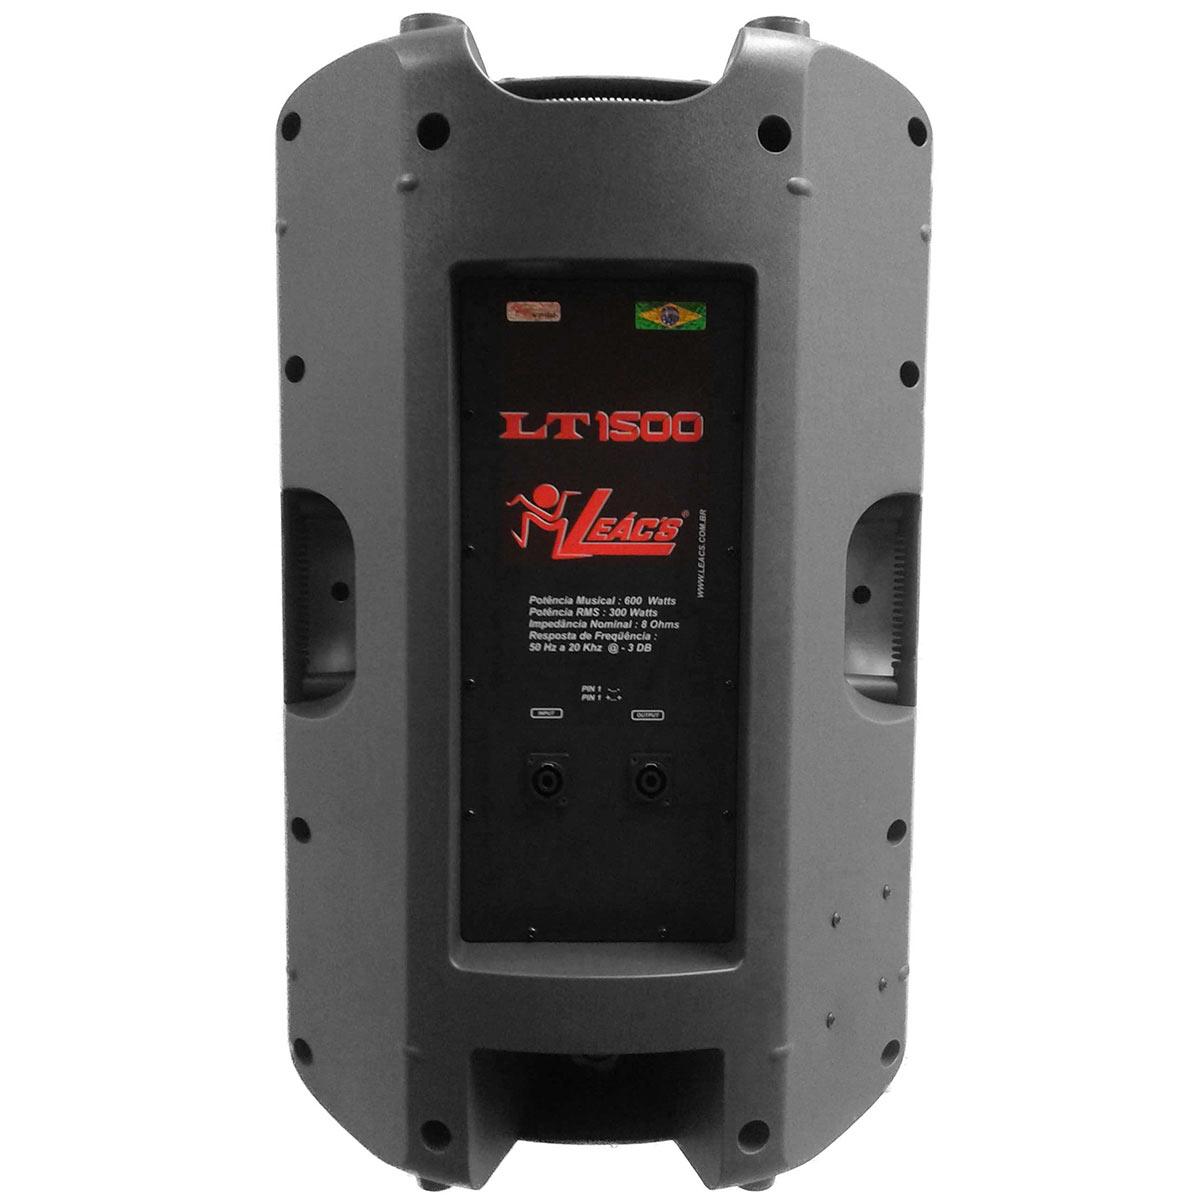 Caixa Passiva Fal 15 Pol 300W - LT 1500 Leacs